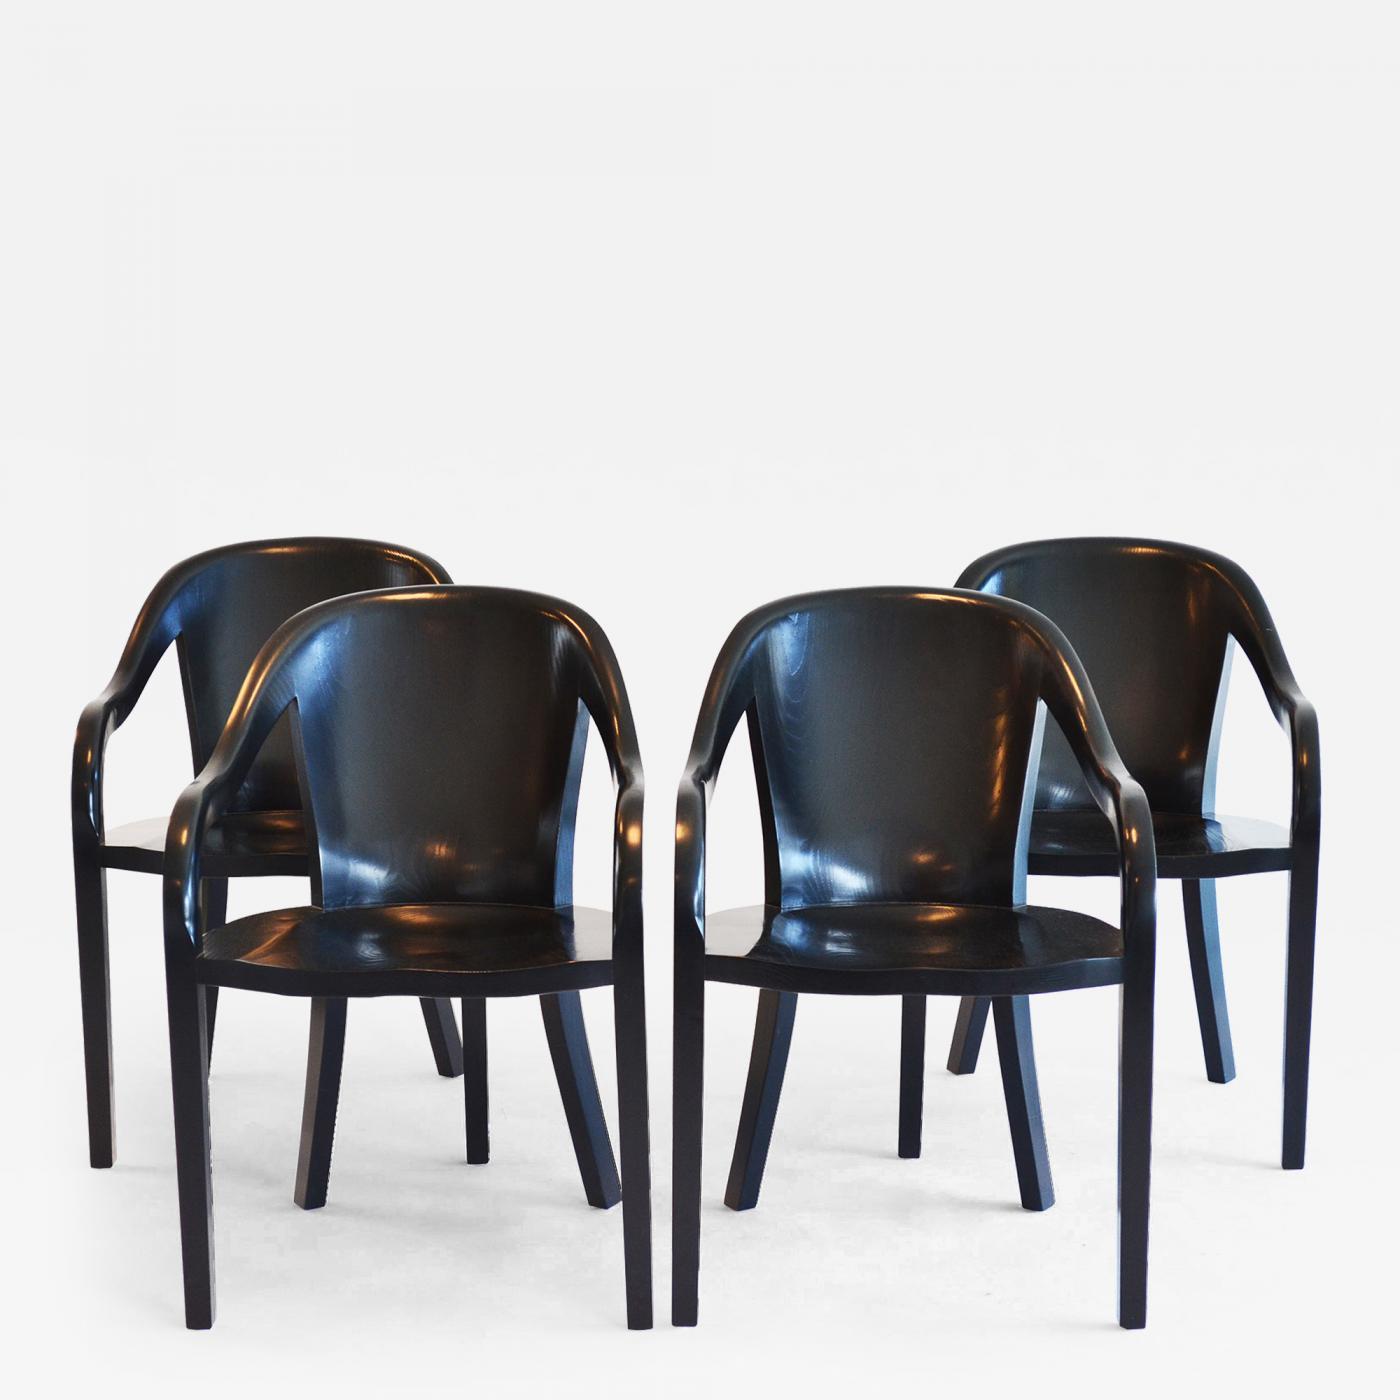 Superb Ward Bennett Set Of Four Ward Bennett University Chairs For Brickell Assoc Dailytribune Chair Design For Home Dailytribuneorg